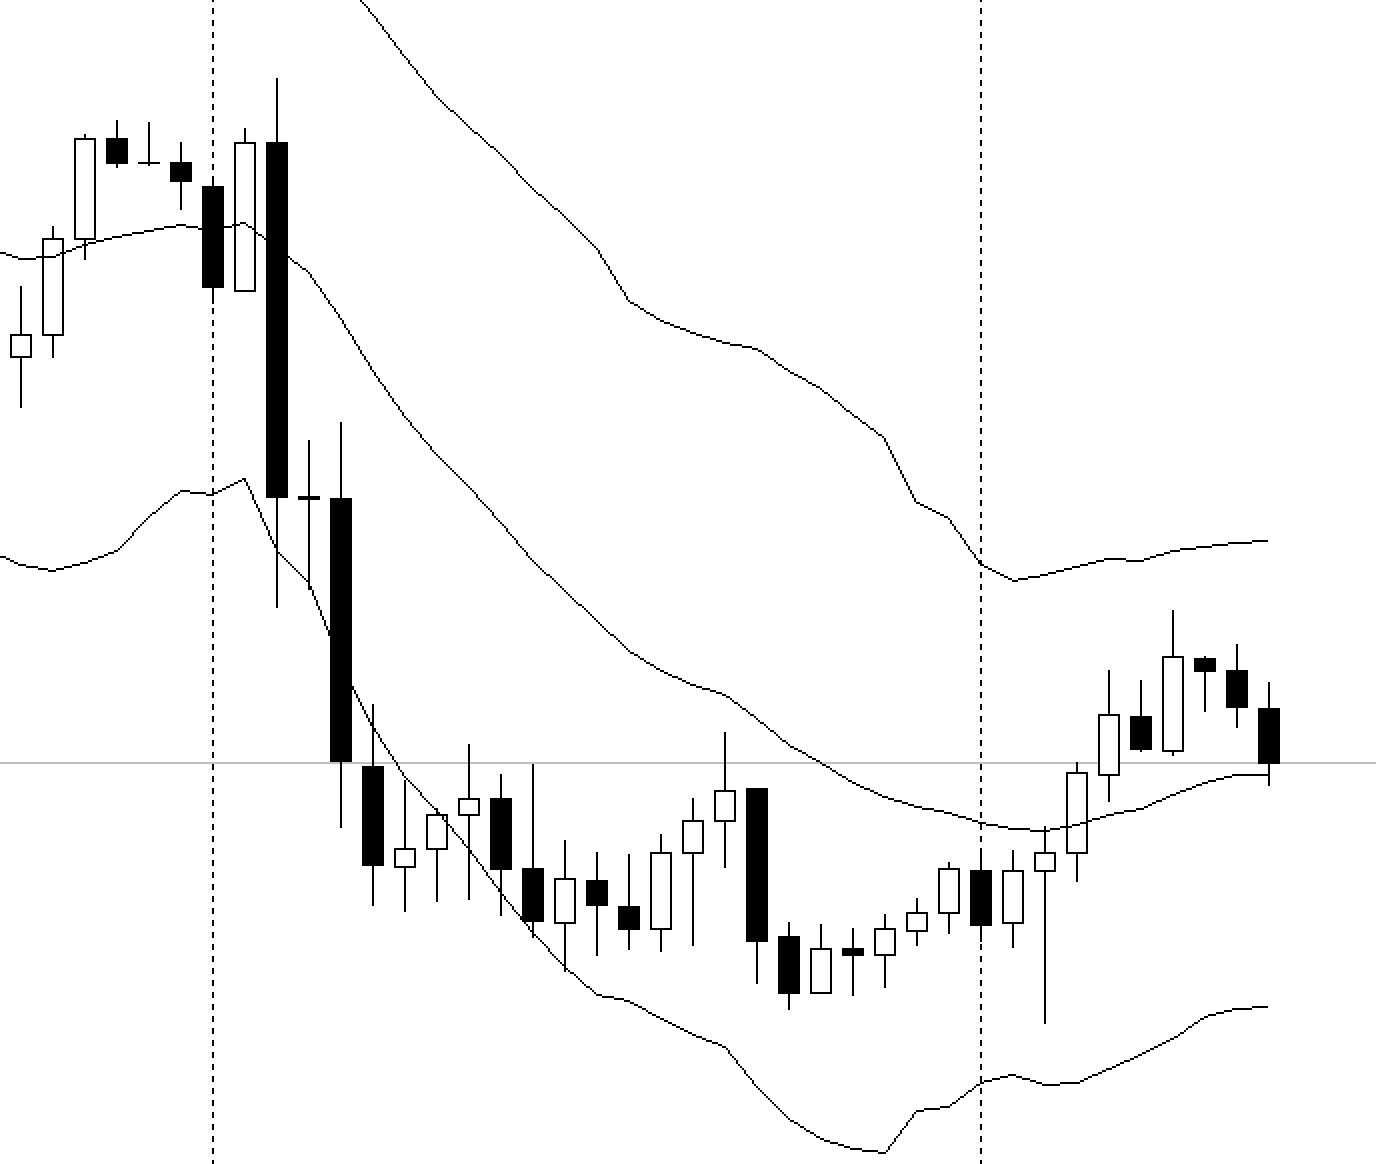 price-action-chuyen-sau-traderviet7.